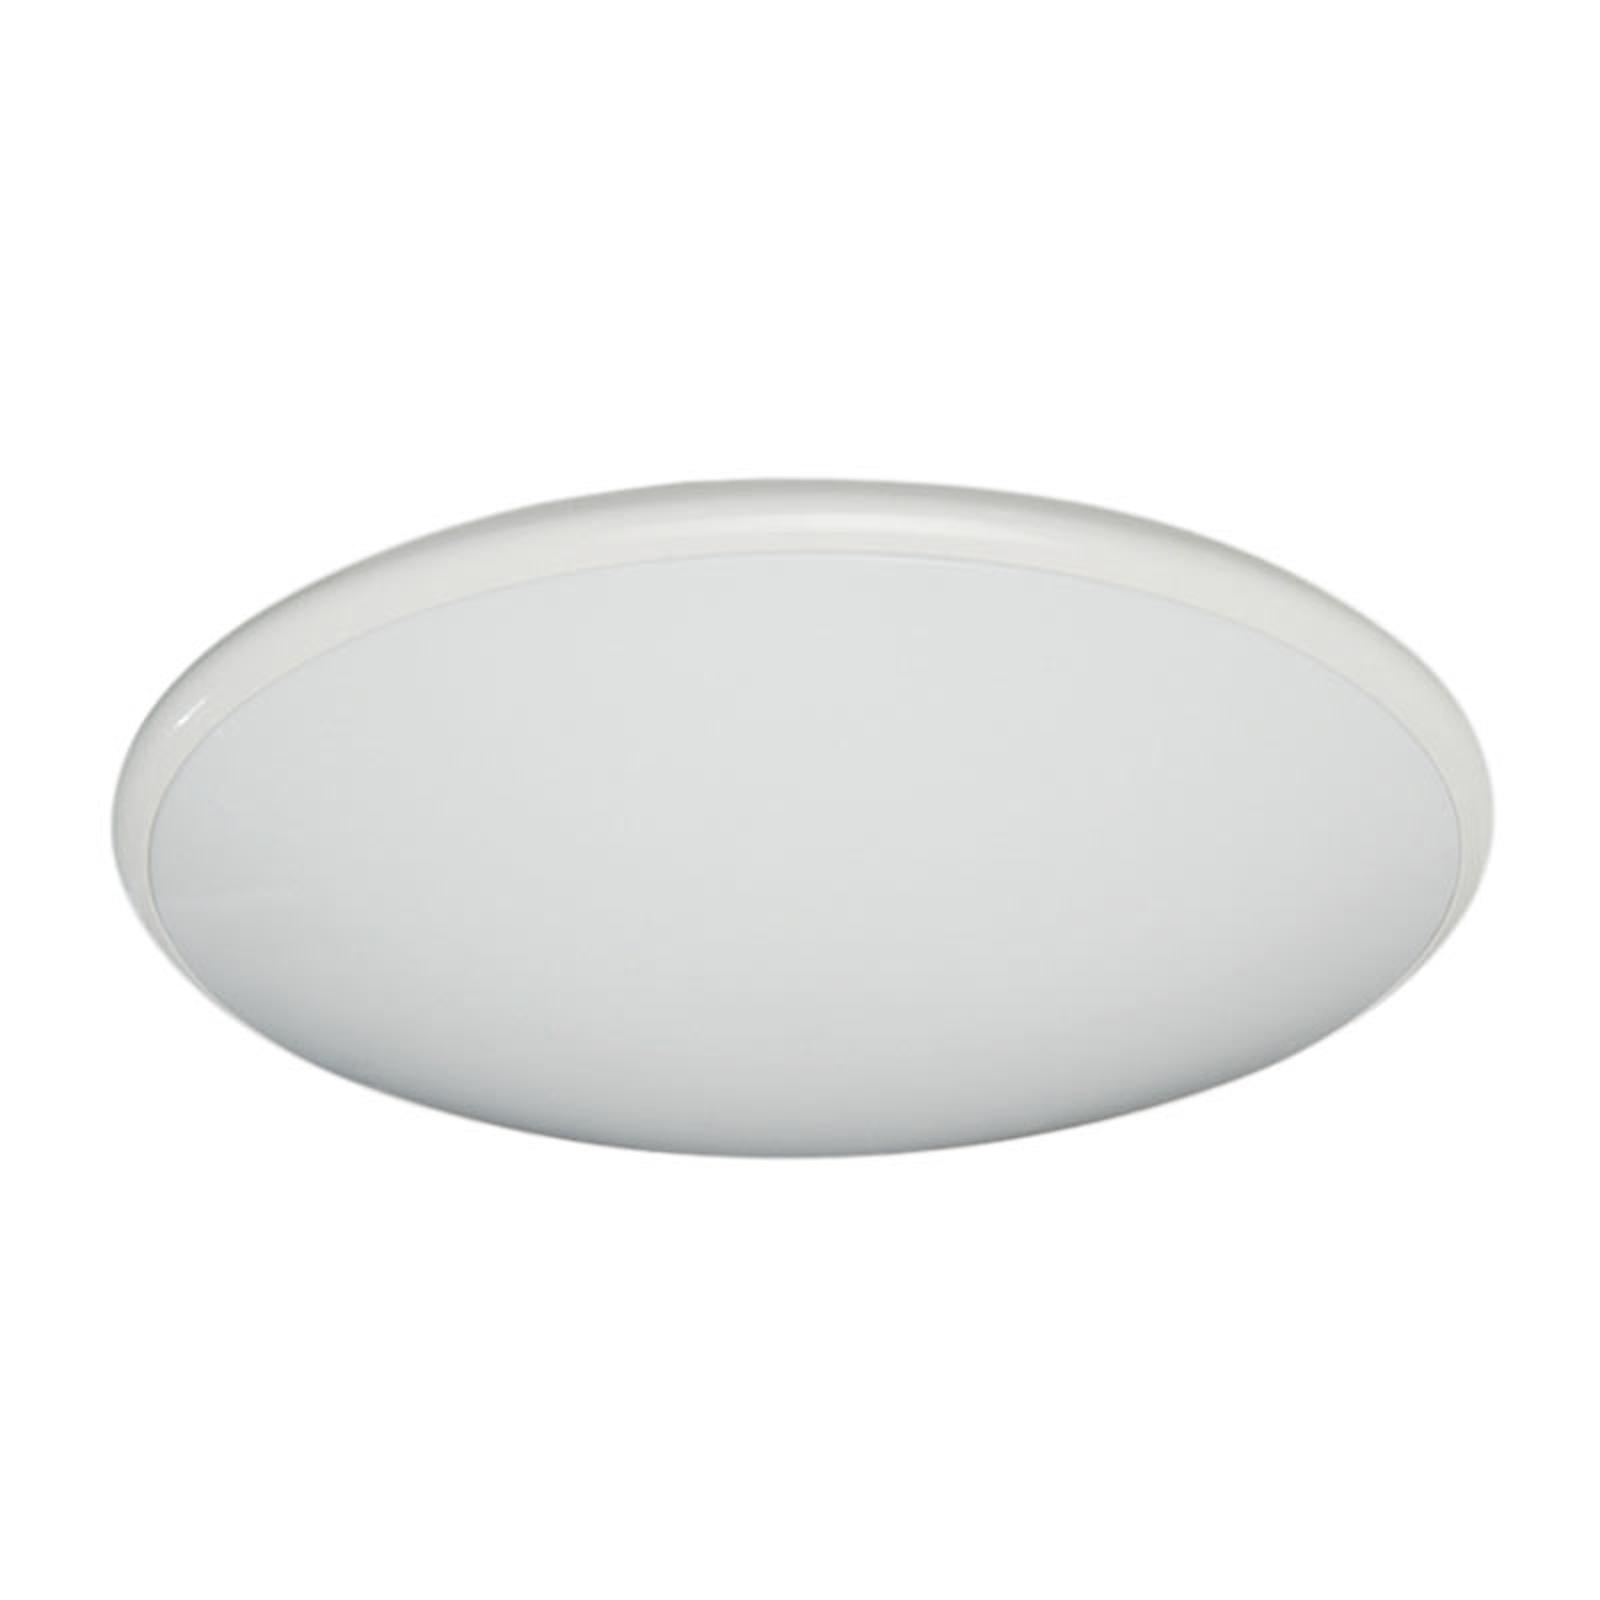 LED-taklampe Sinus-S425 1000 HF 42,5 cm 3000K